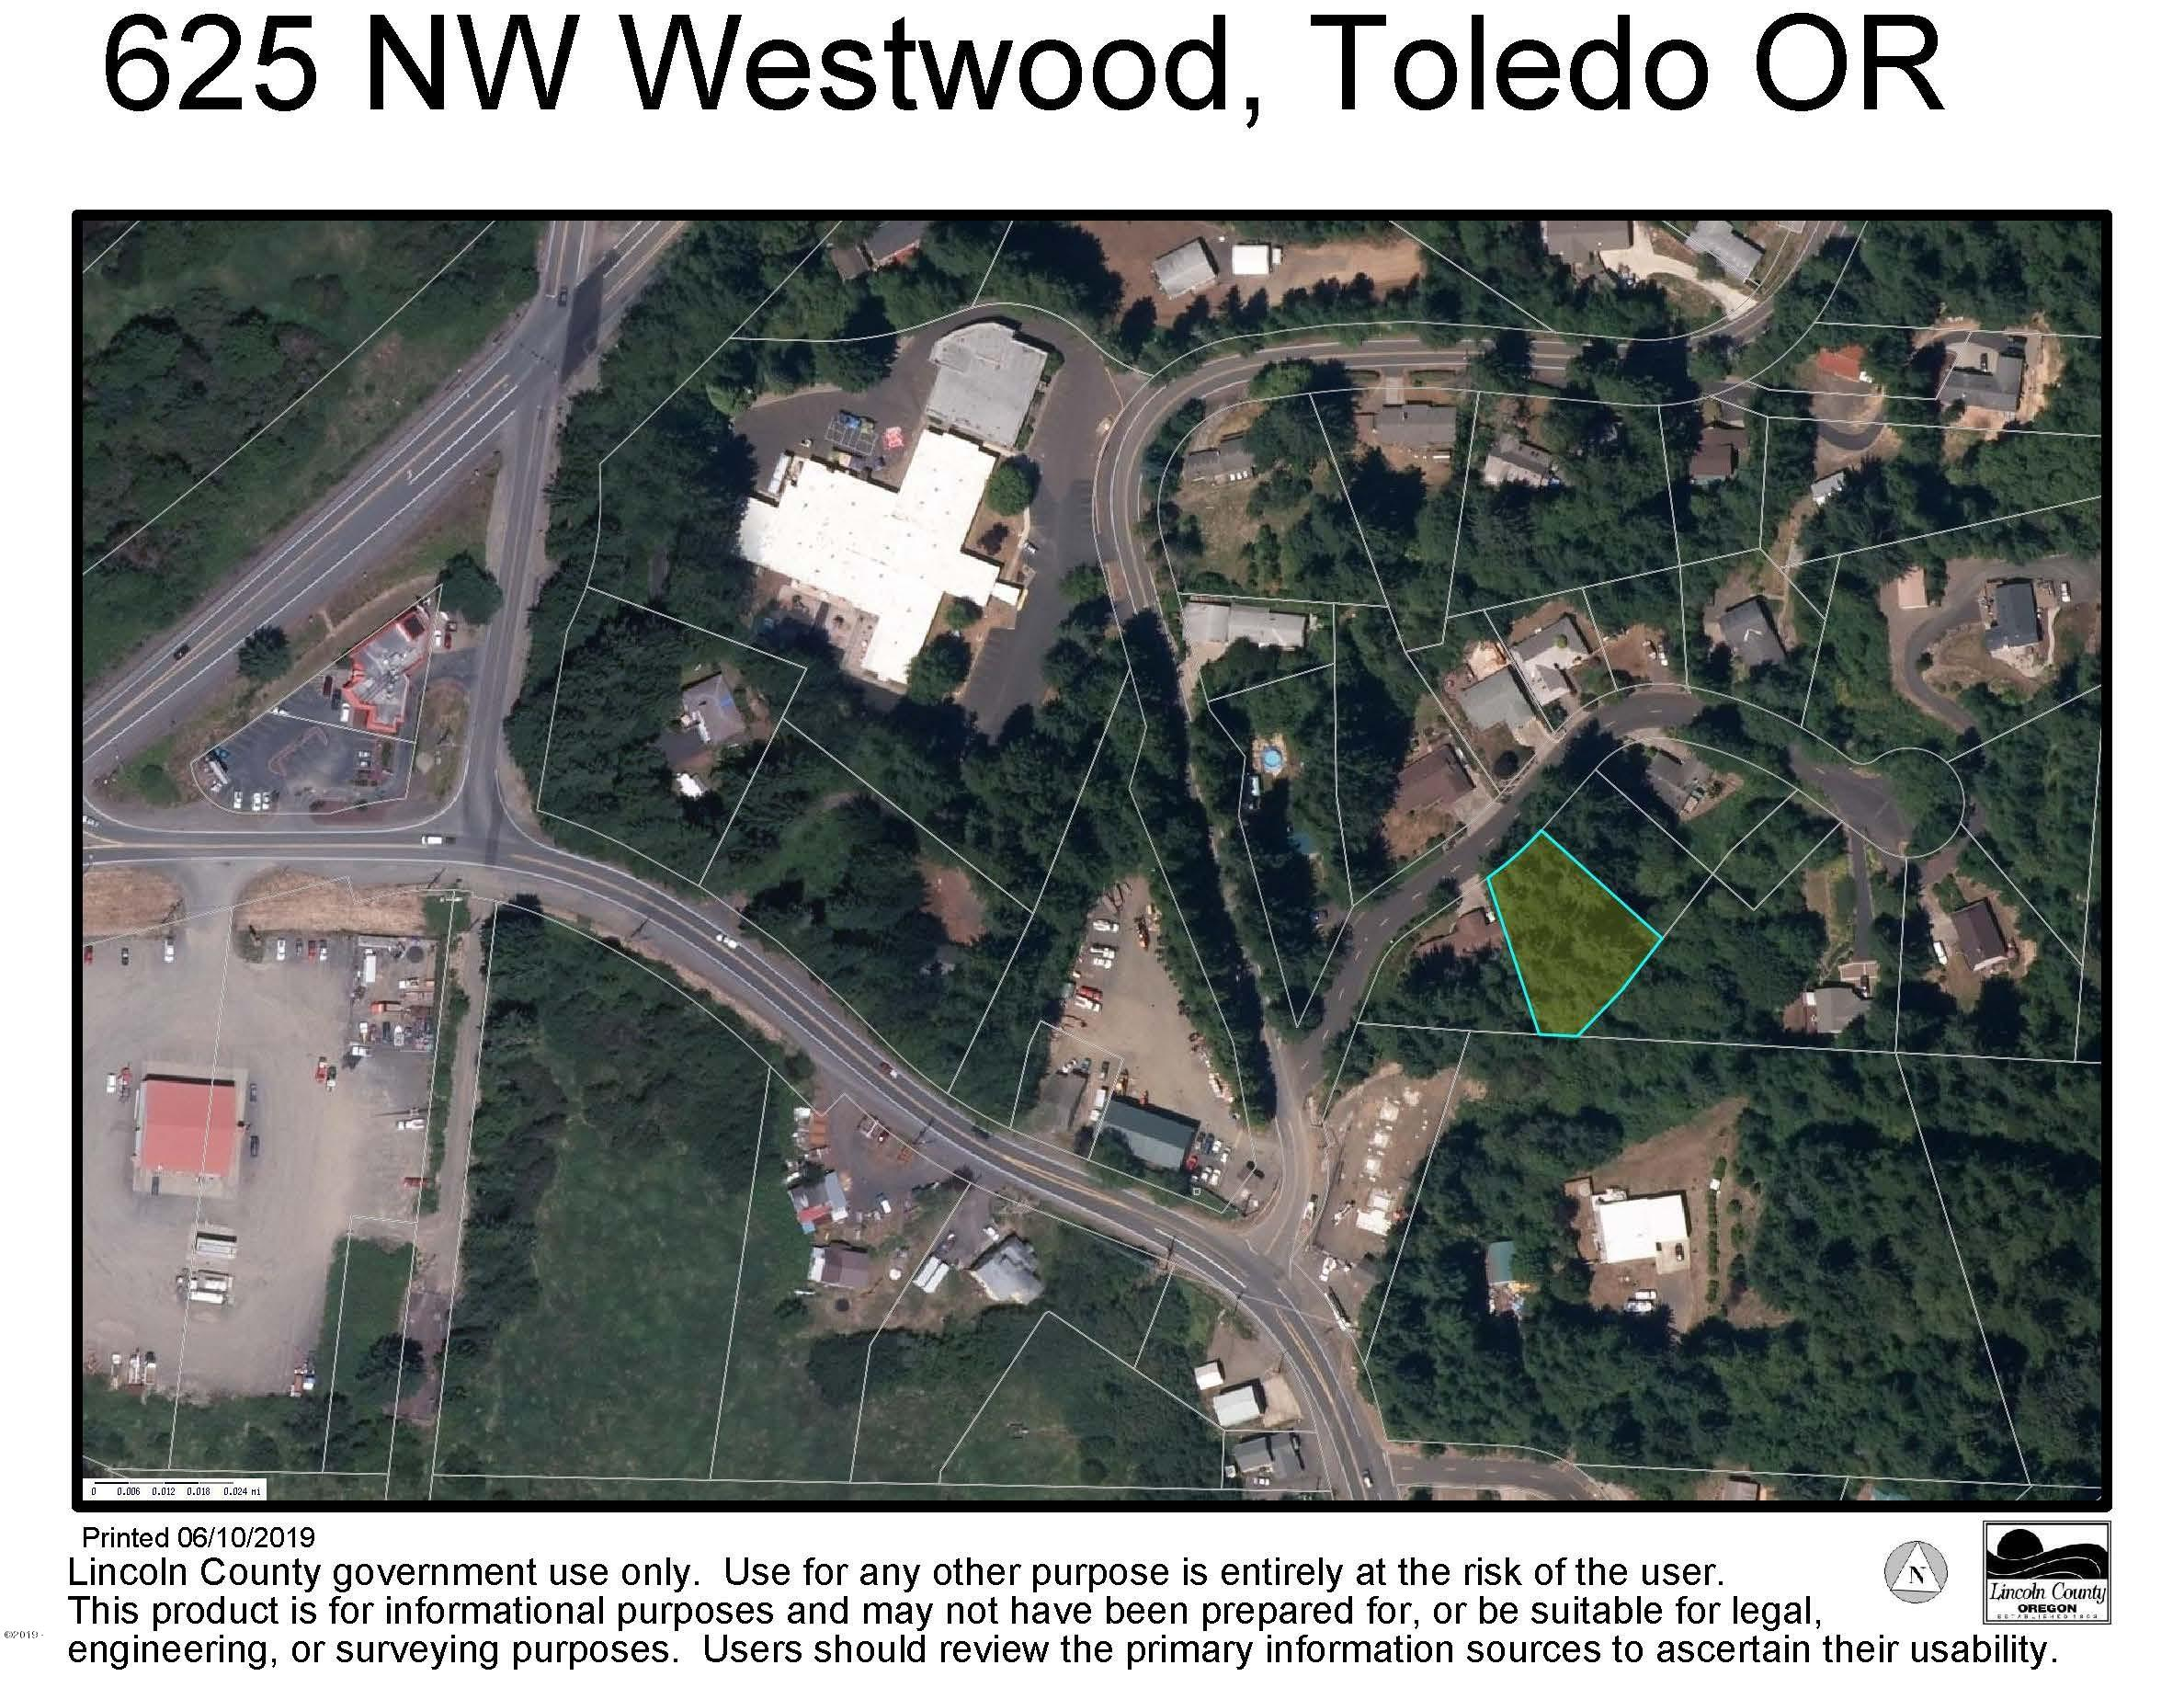 625 NW Westwood Street, Toledo, OR 97391 - Surveyors Aerial Map